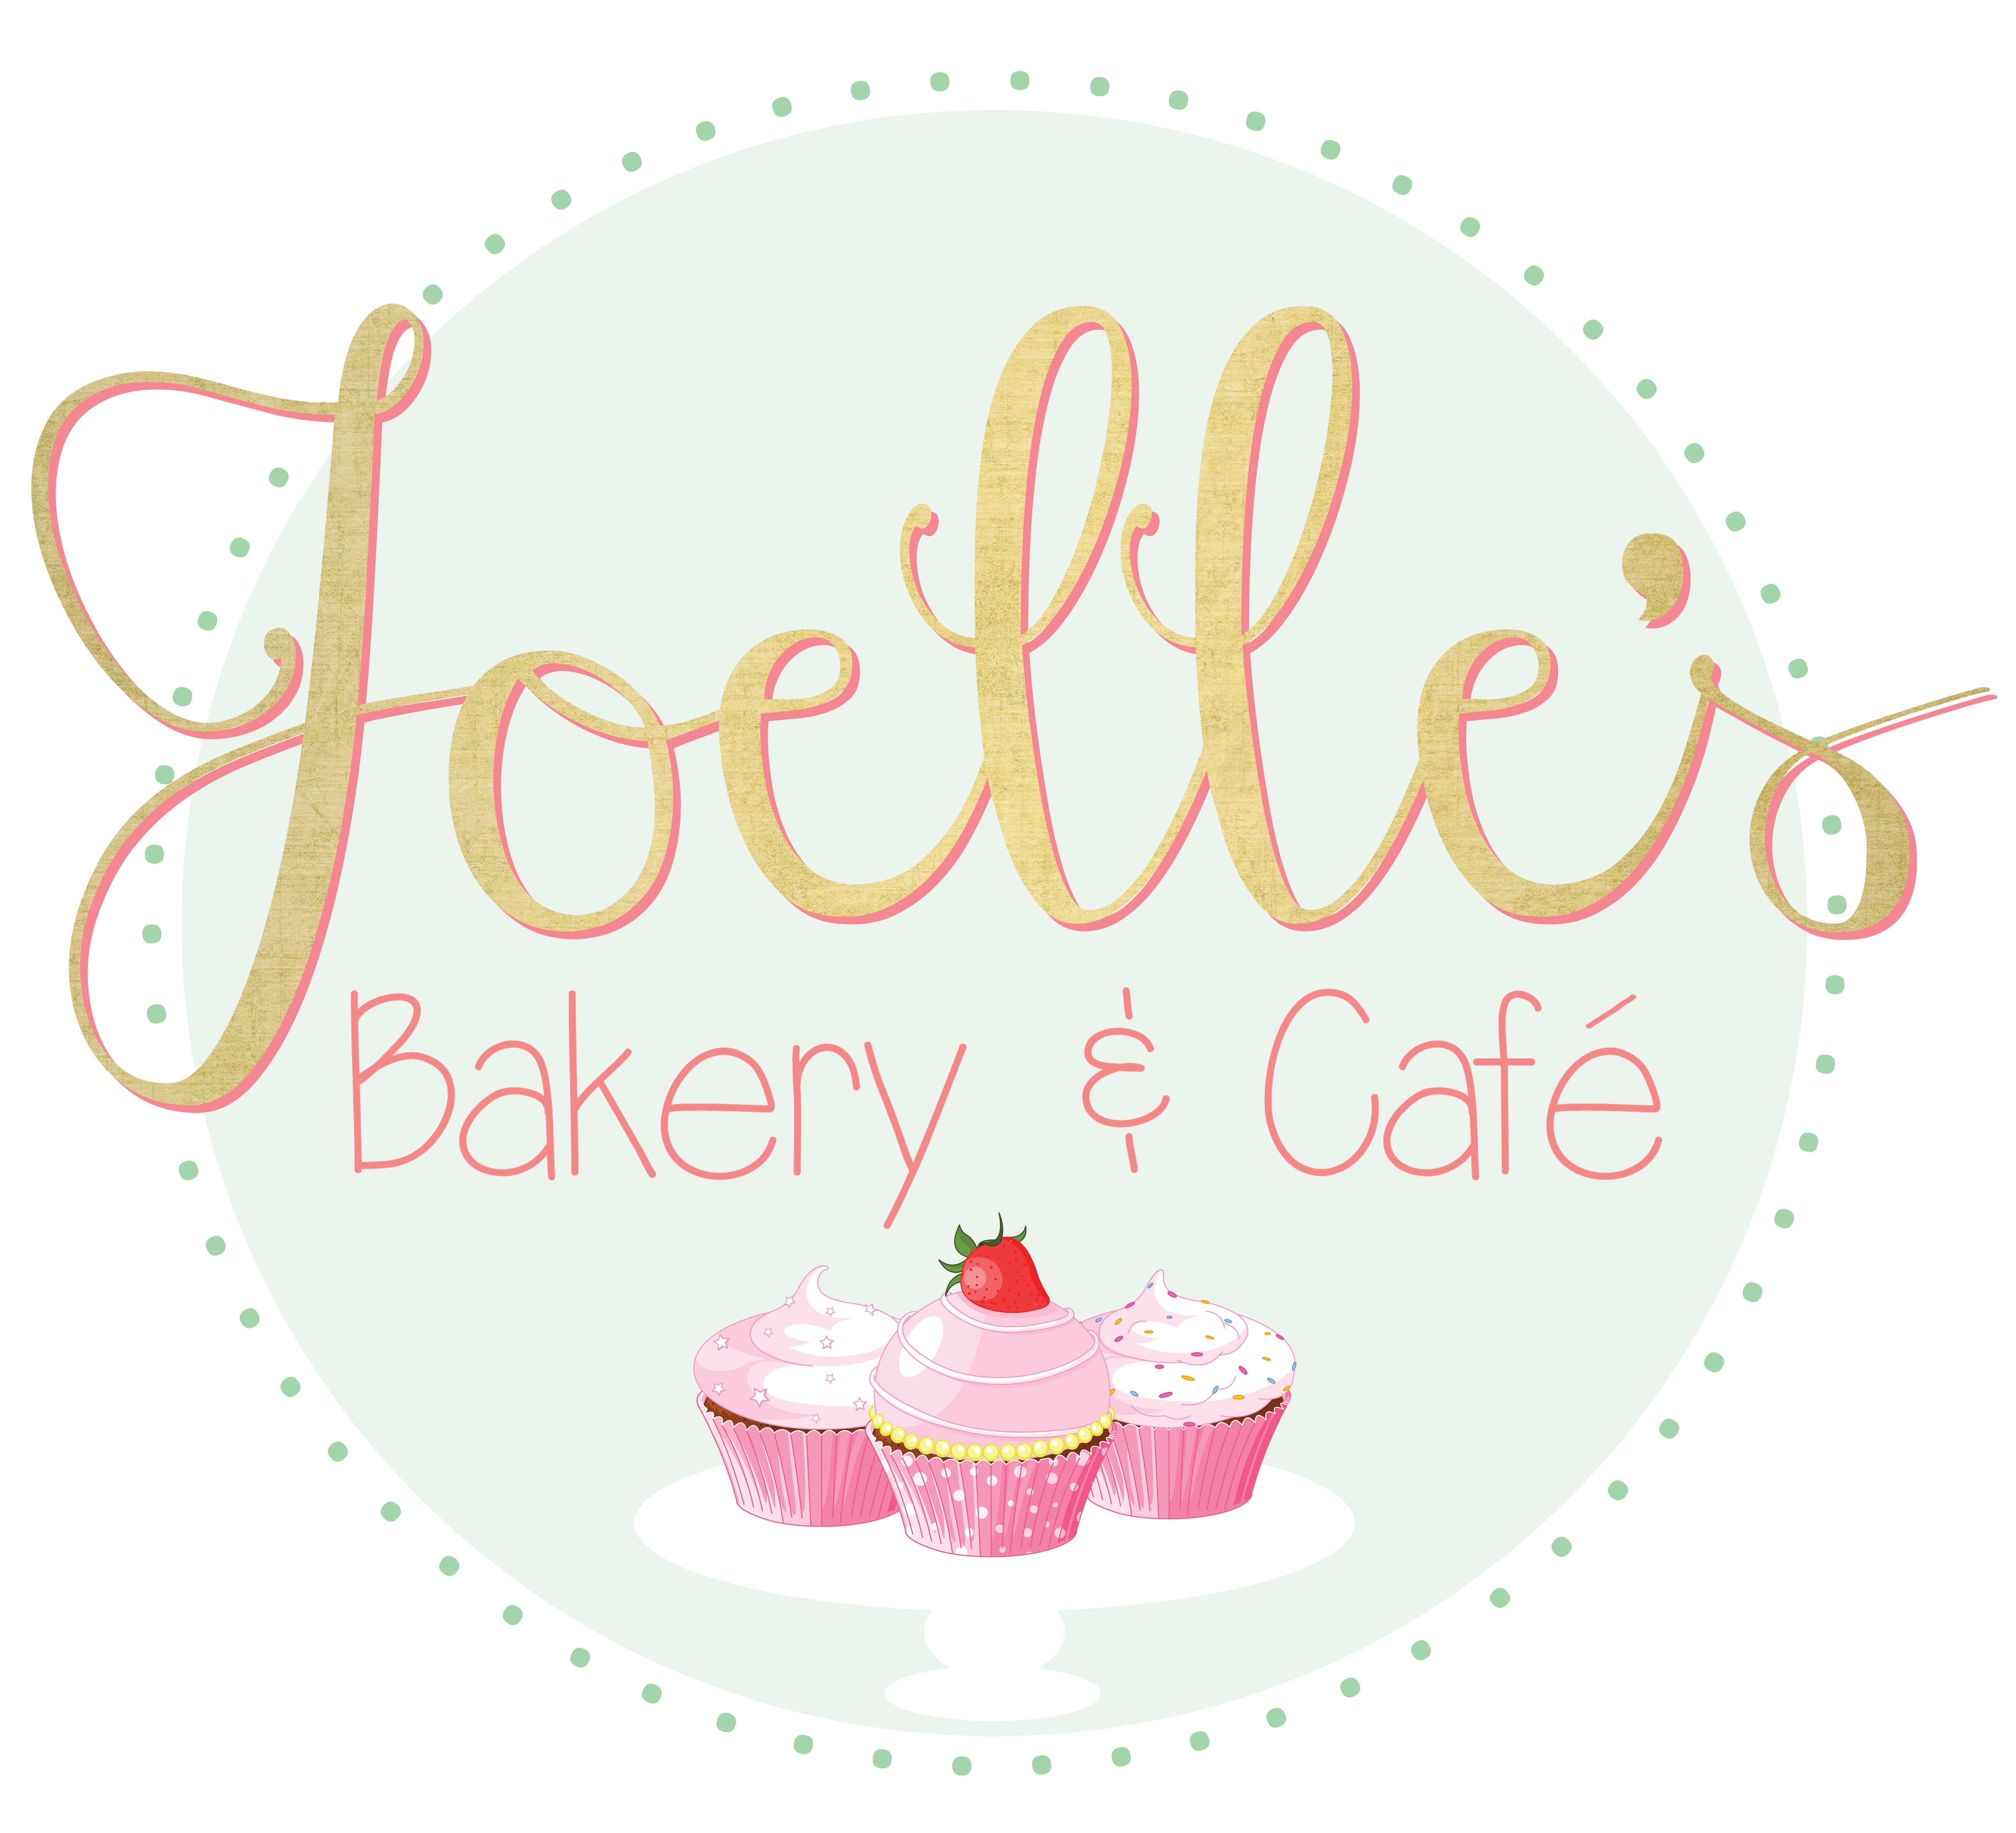 Joelles Bakery Cafe In Hopkinsville KY